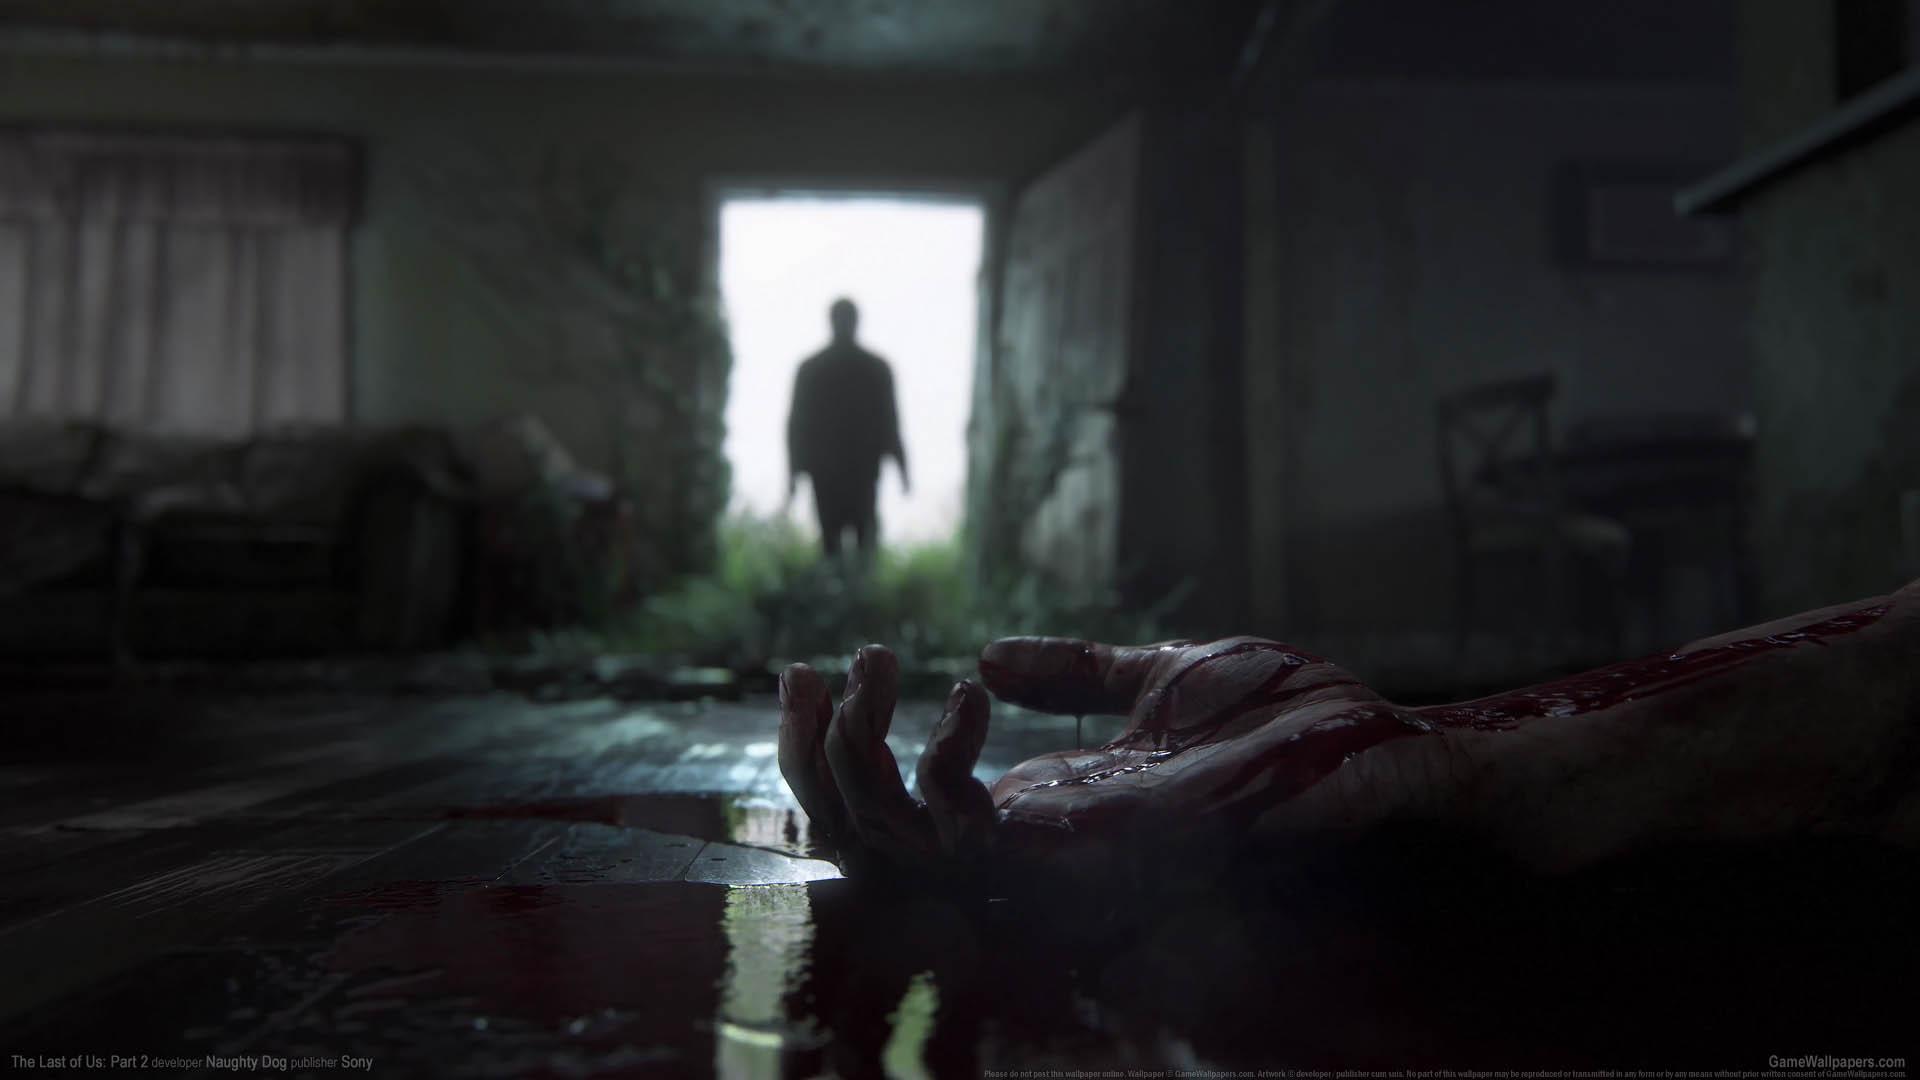 The Last of Us: Part 2 wallpaper 01 1920x1080